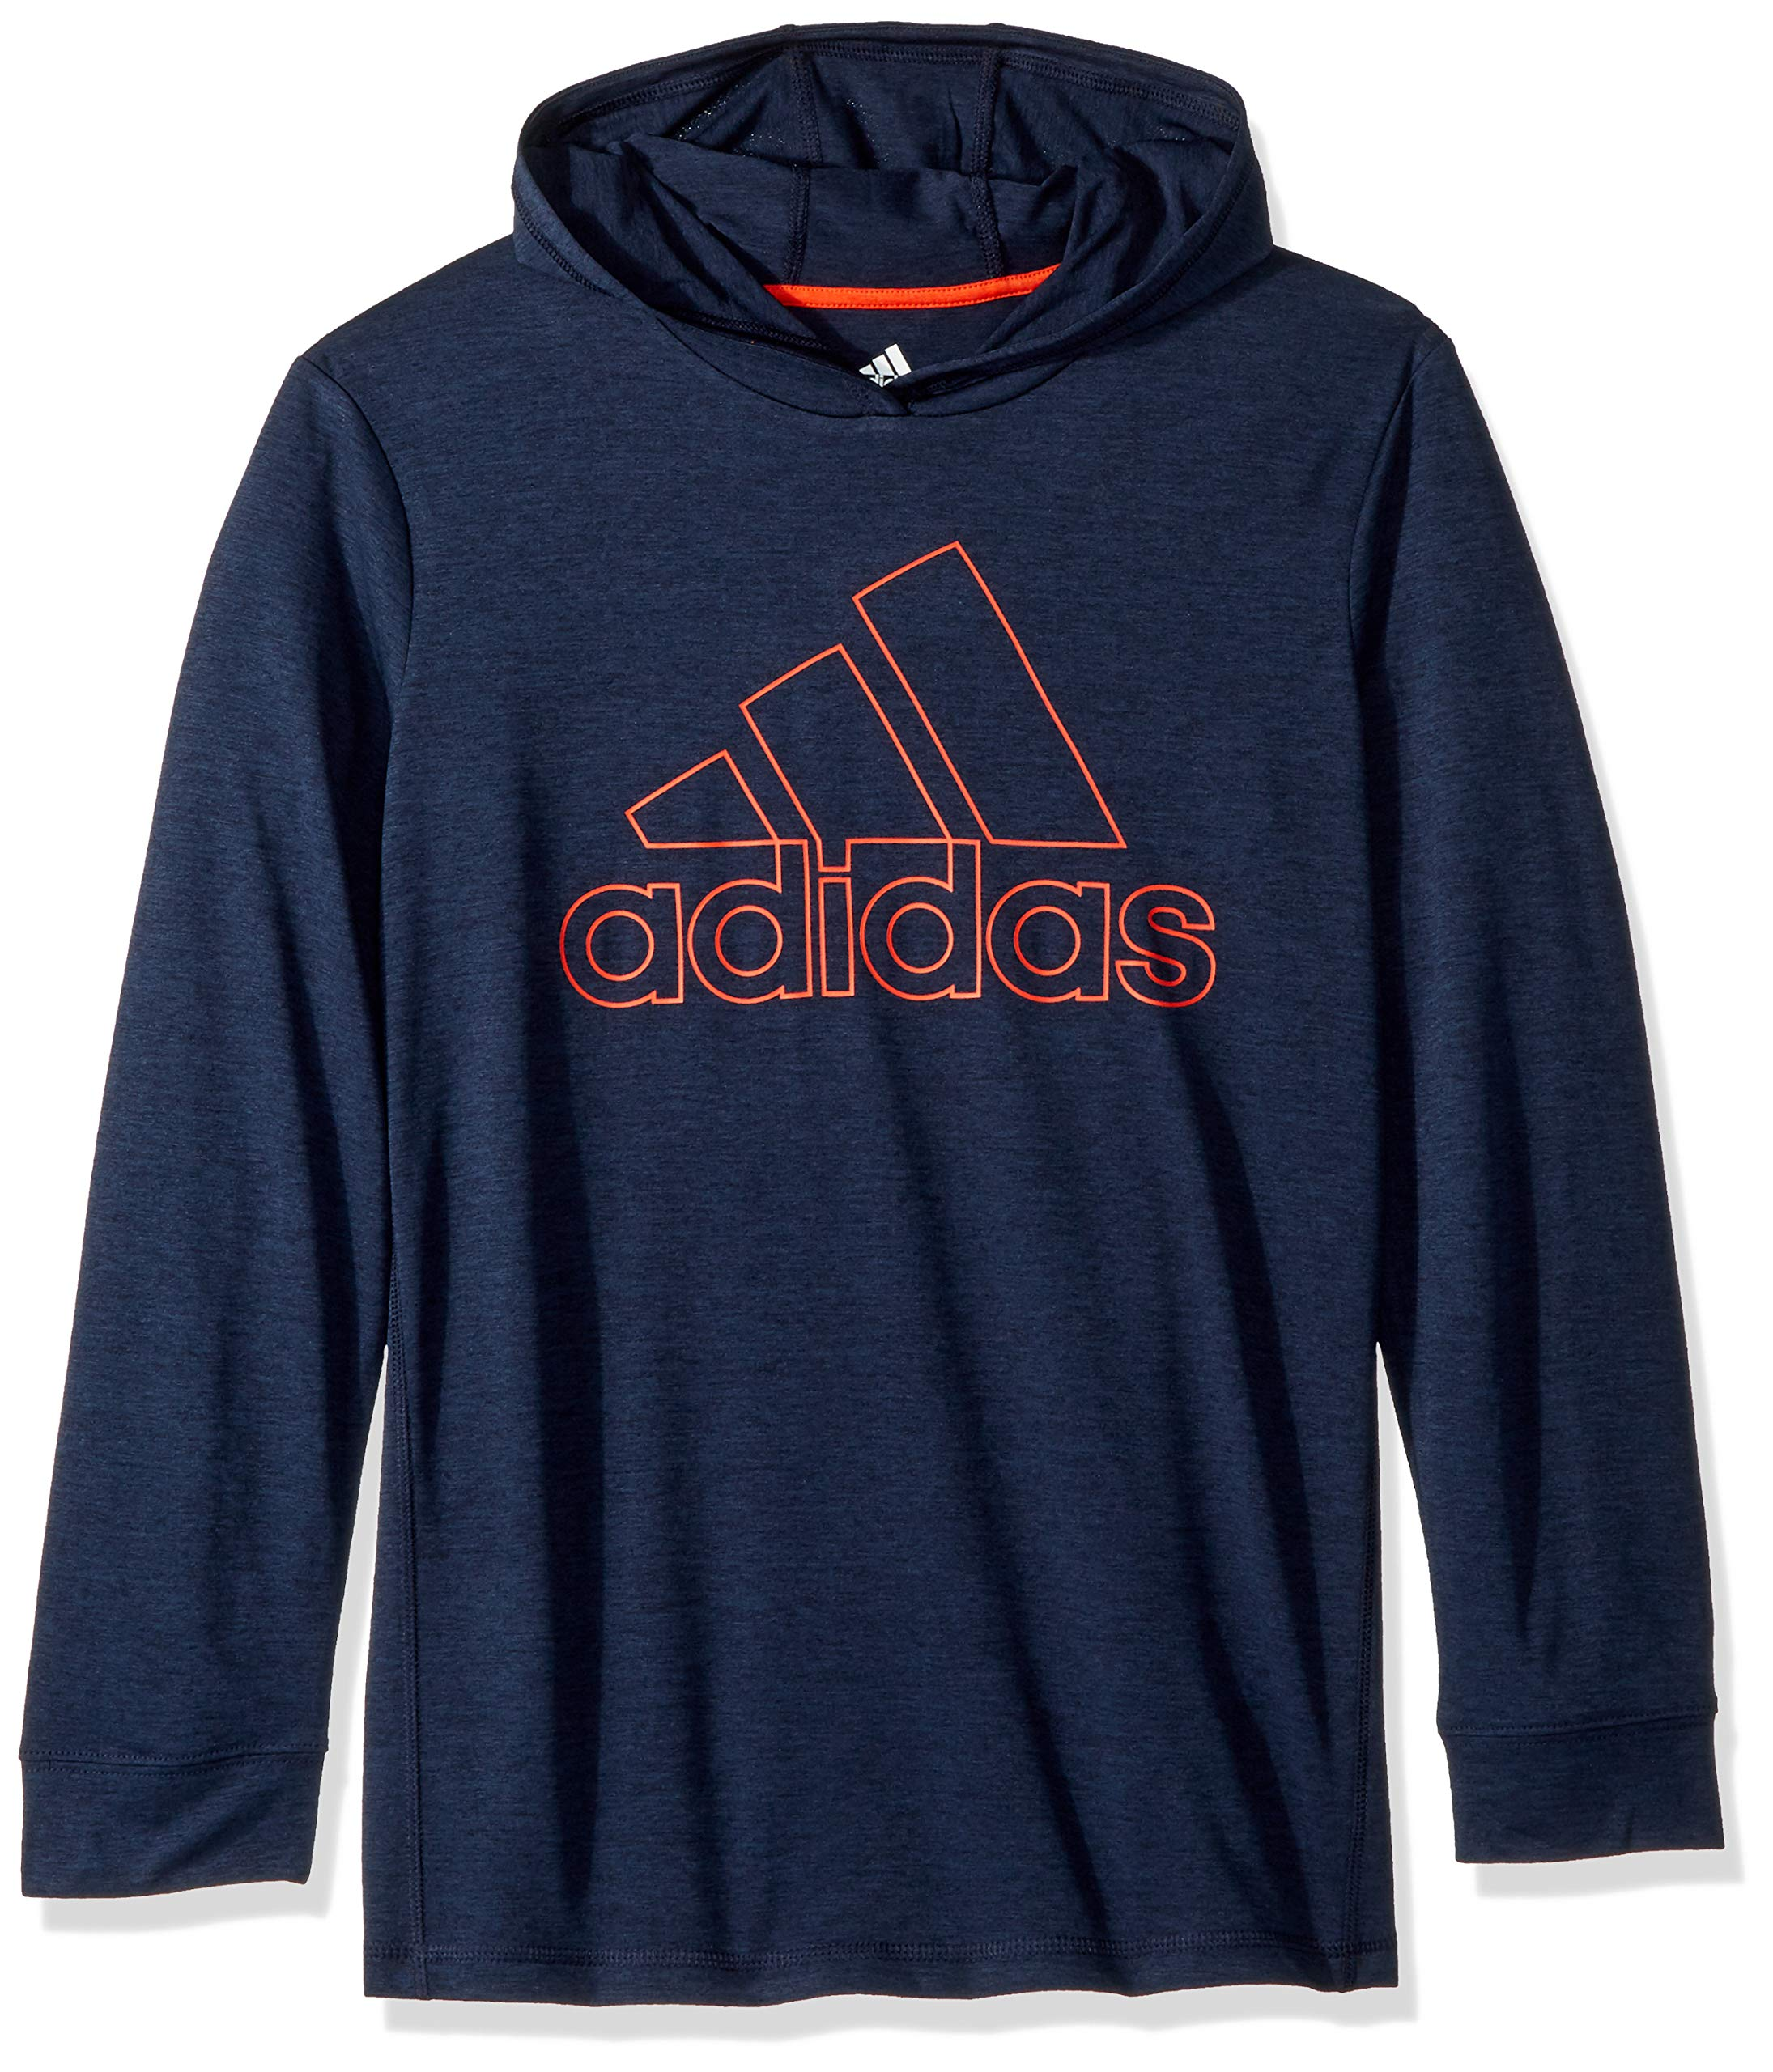 adidas Big Boys' Athletic Pullover Hoodie, Collegiate Navy Heather, XL(18/20)